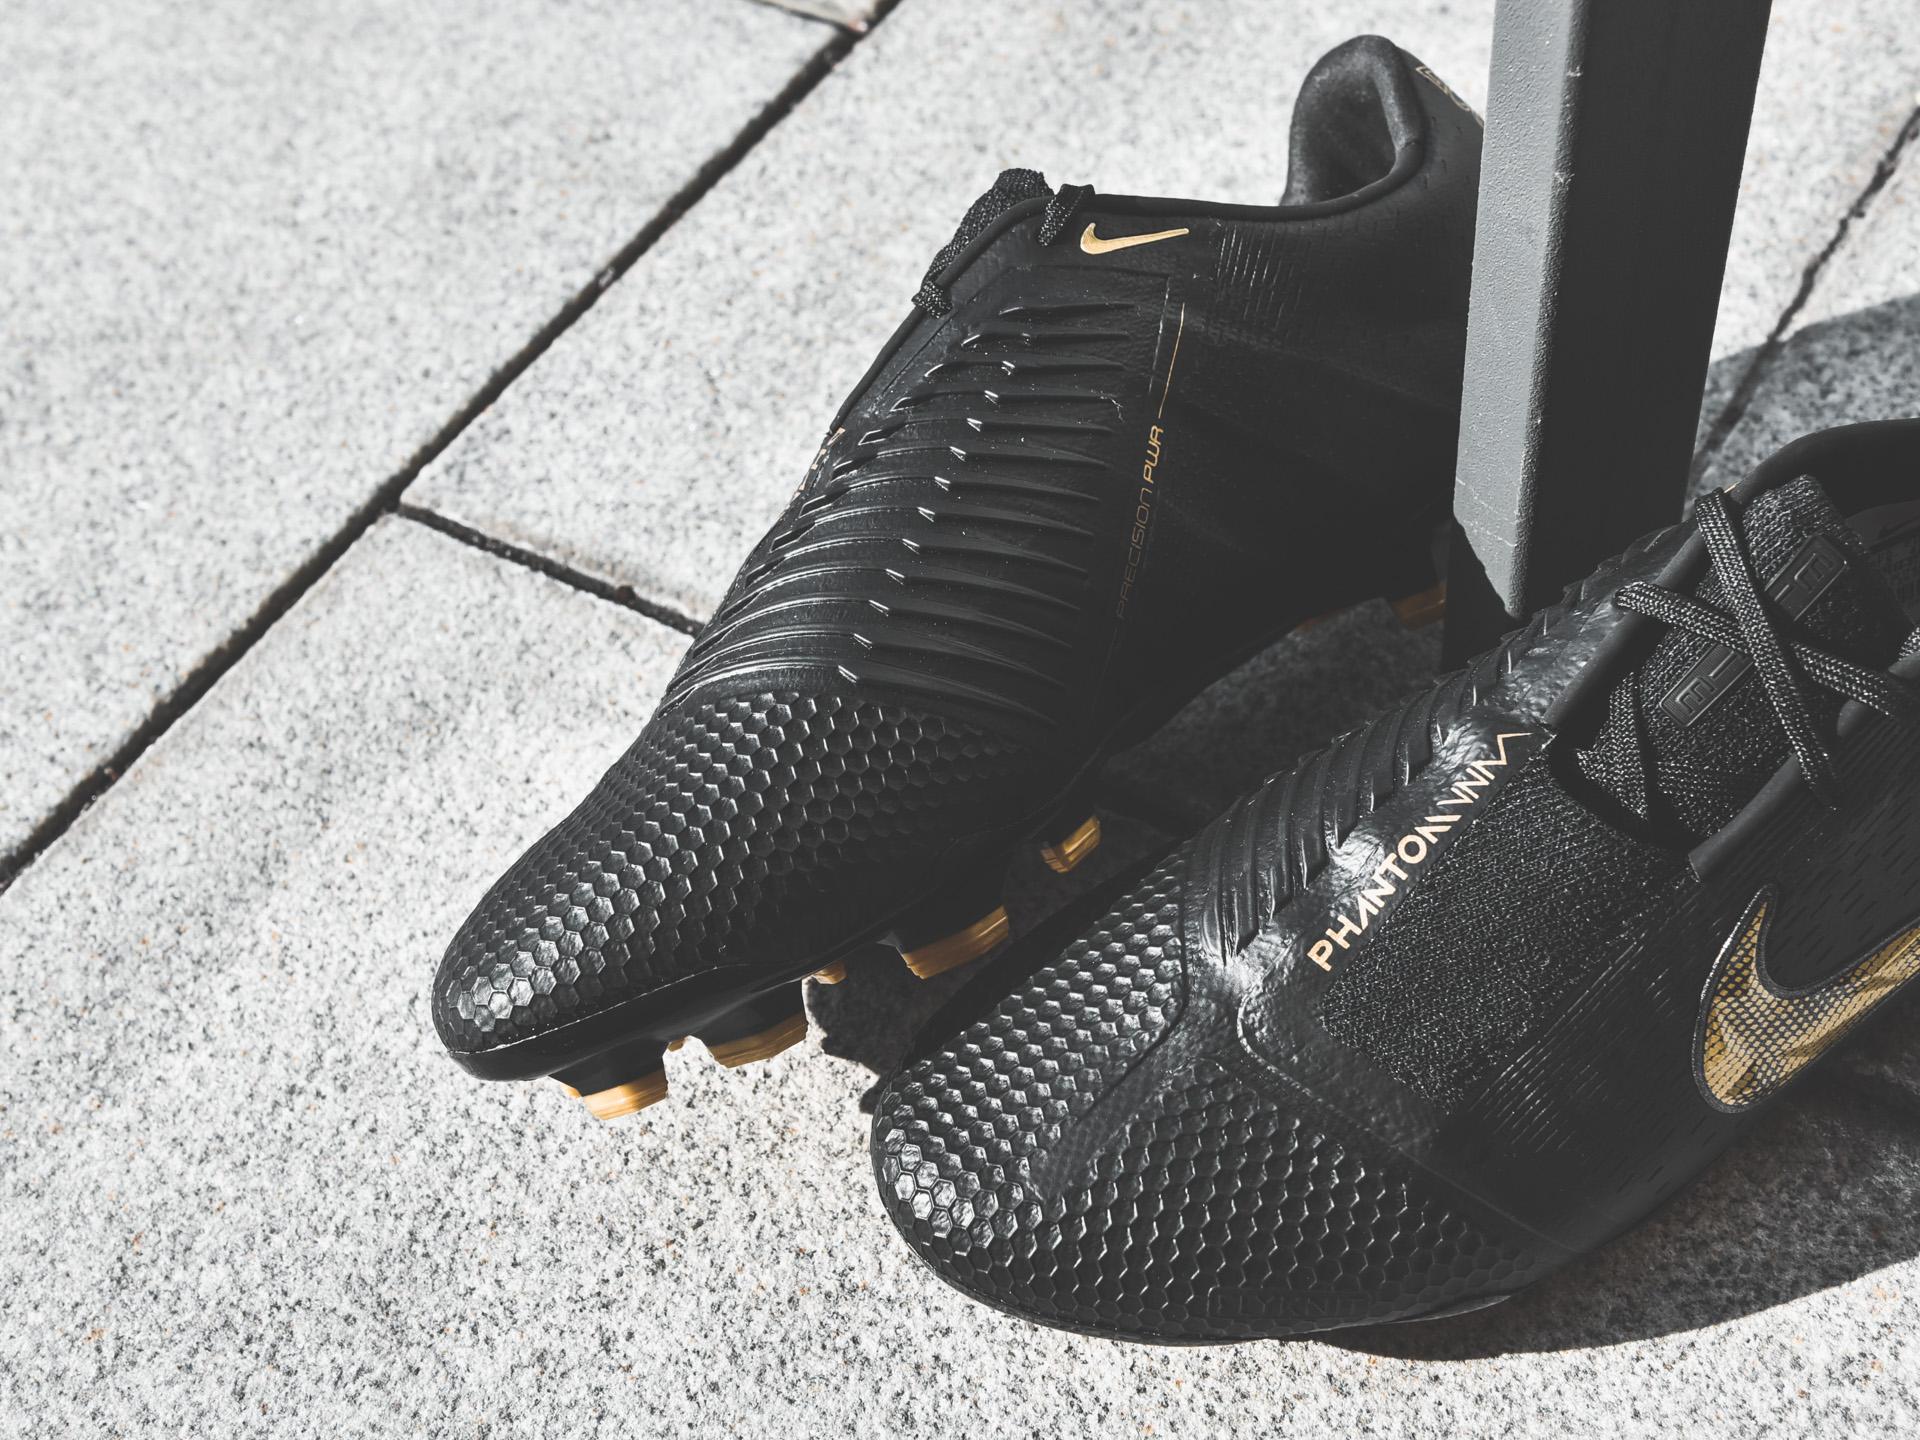 6ec82745877 Nike Black Lux Pack - Top4Football.com